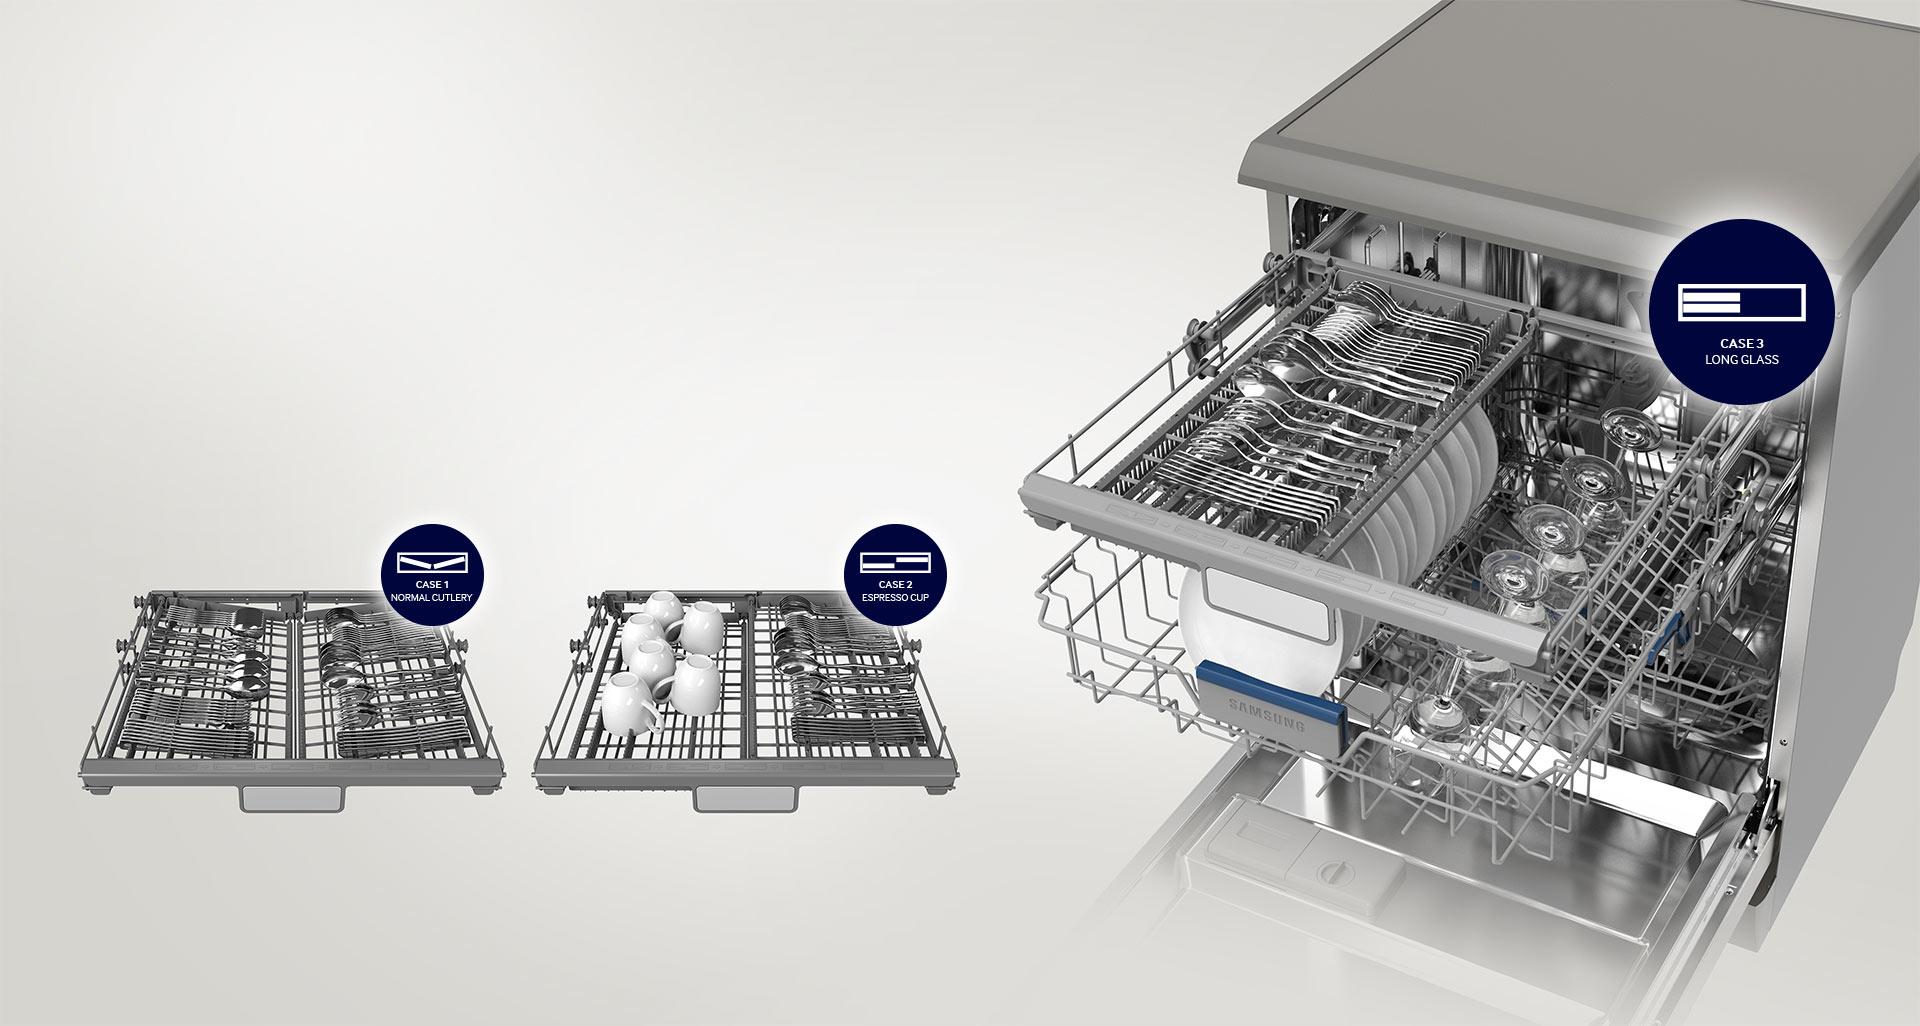 ماشین ظرفشویی سامسونگ DW60M5060BB (1)-min